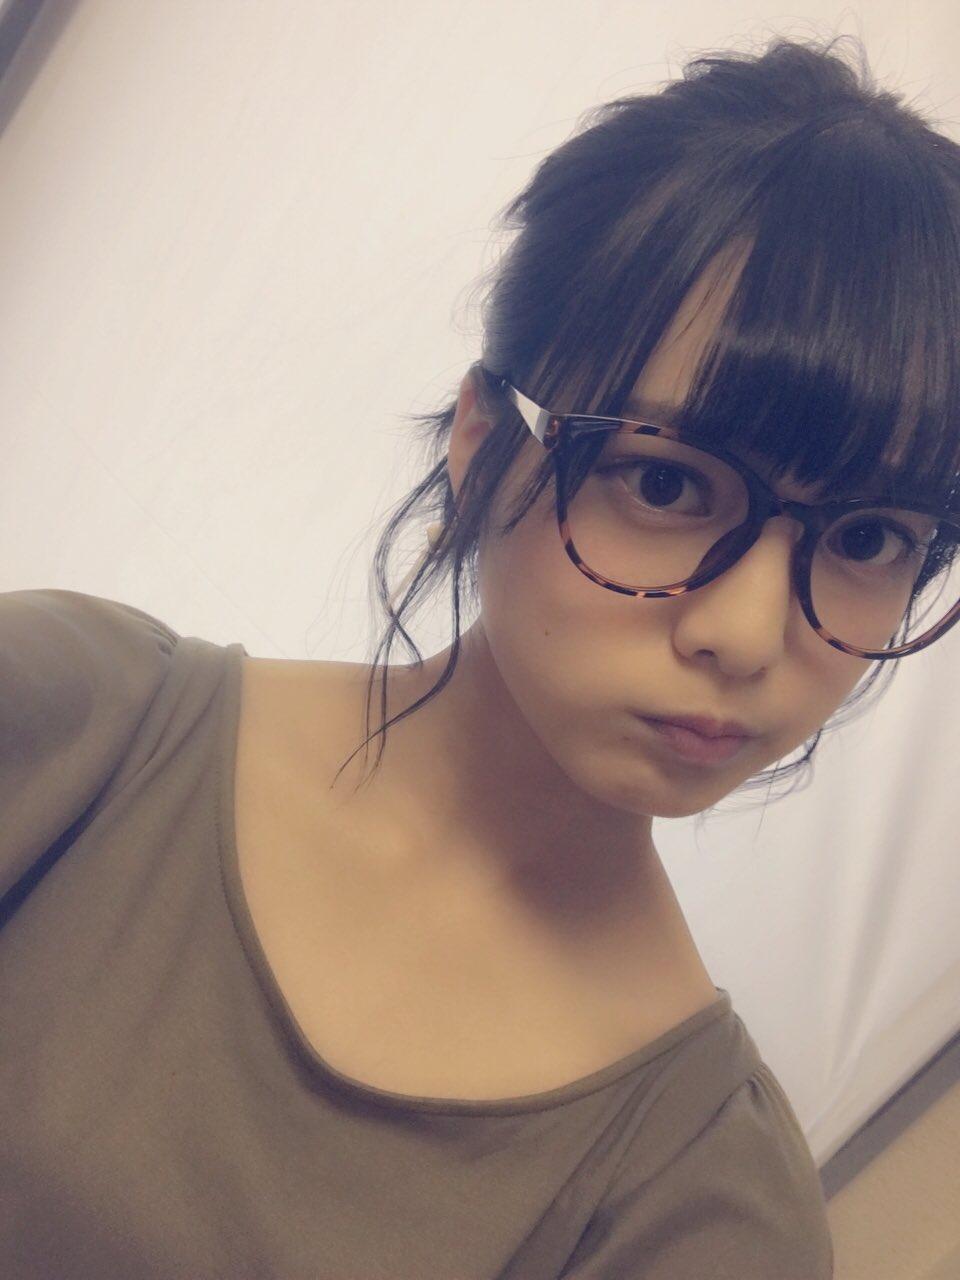 hirate_yurina010.jpg